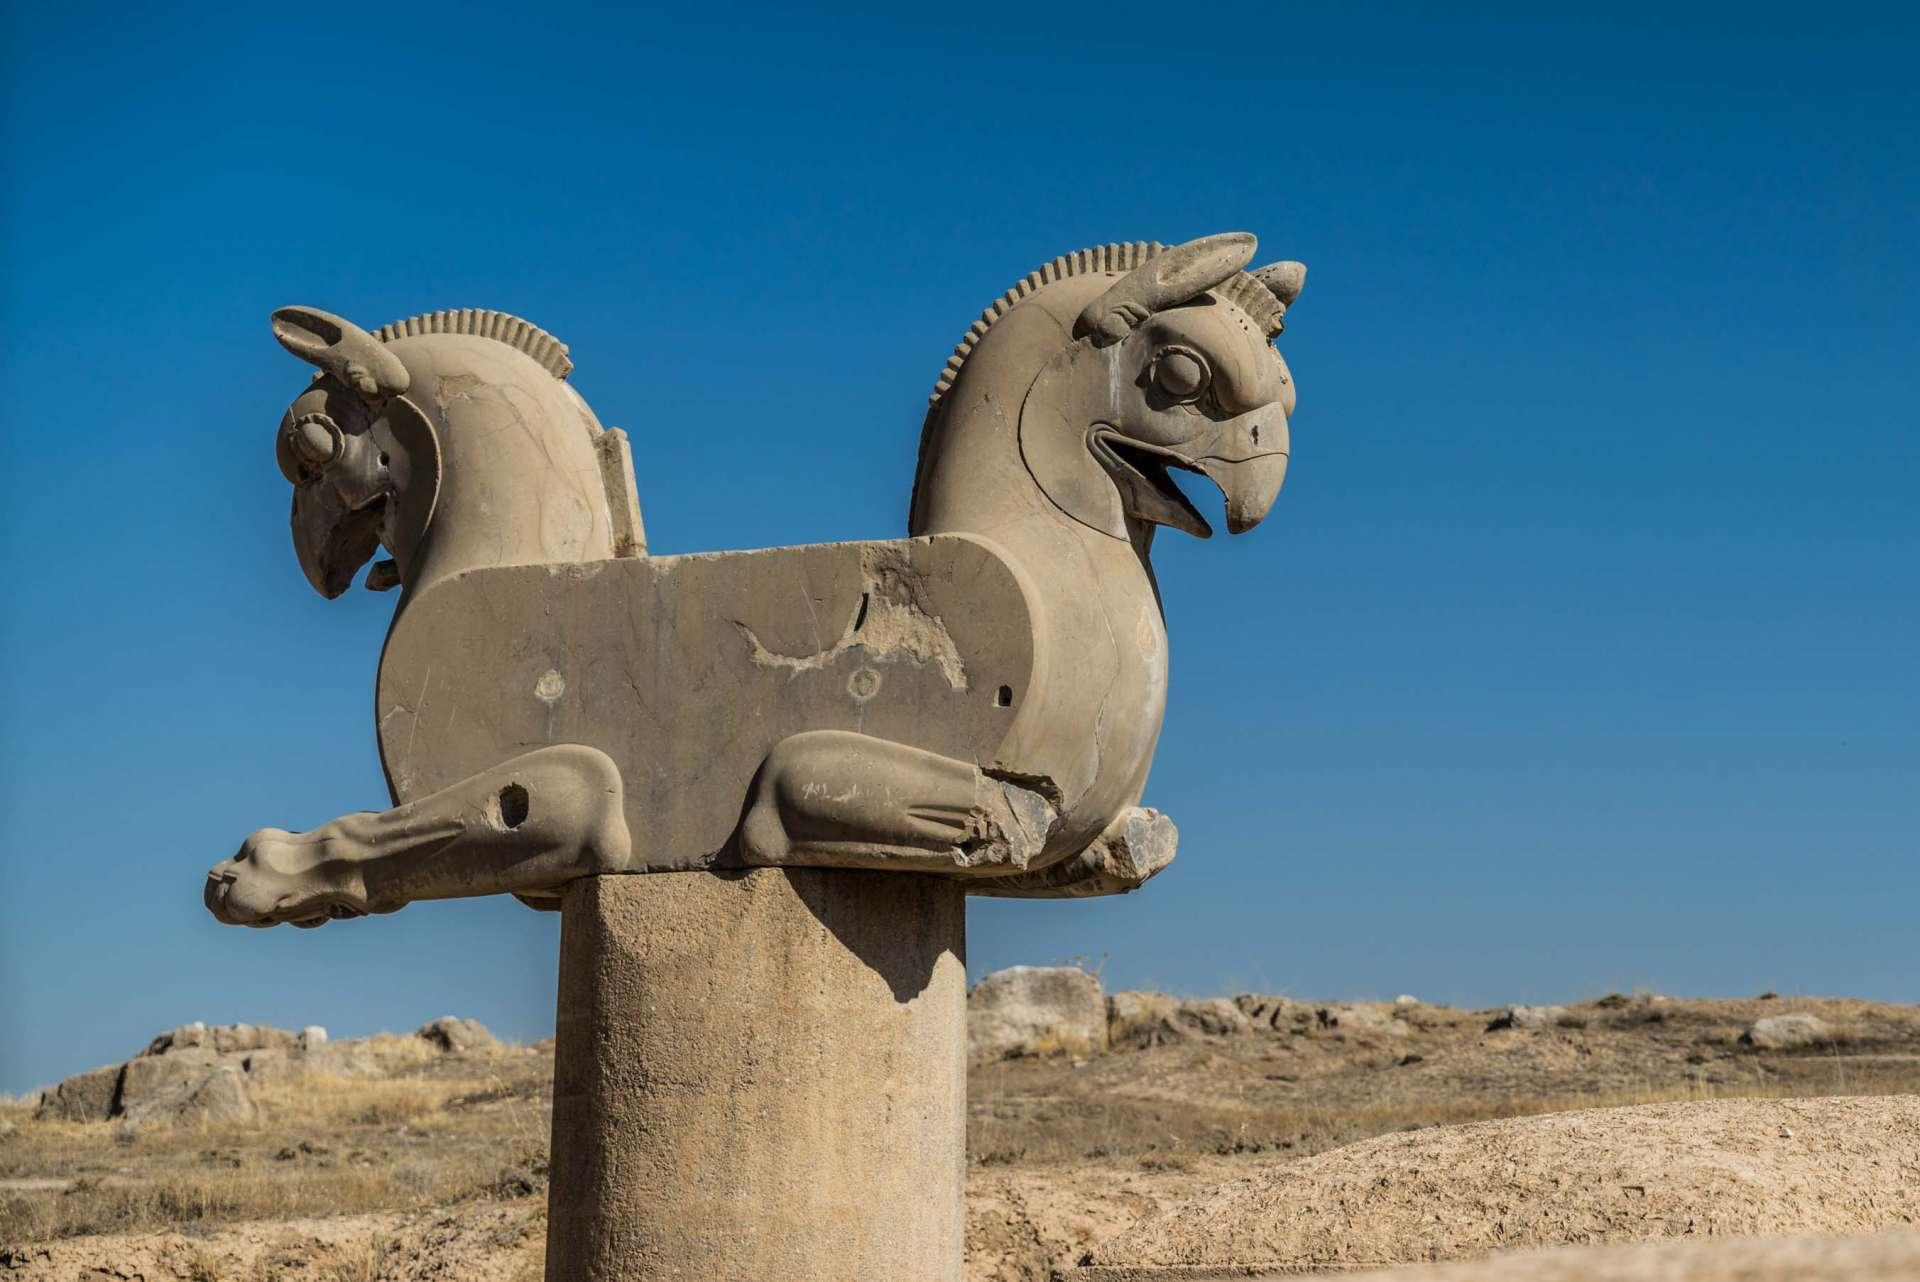 Persepolis Iran - Gryphon